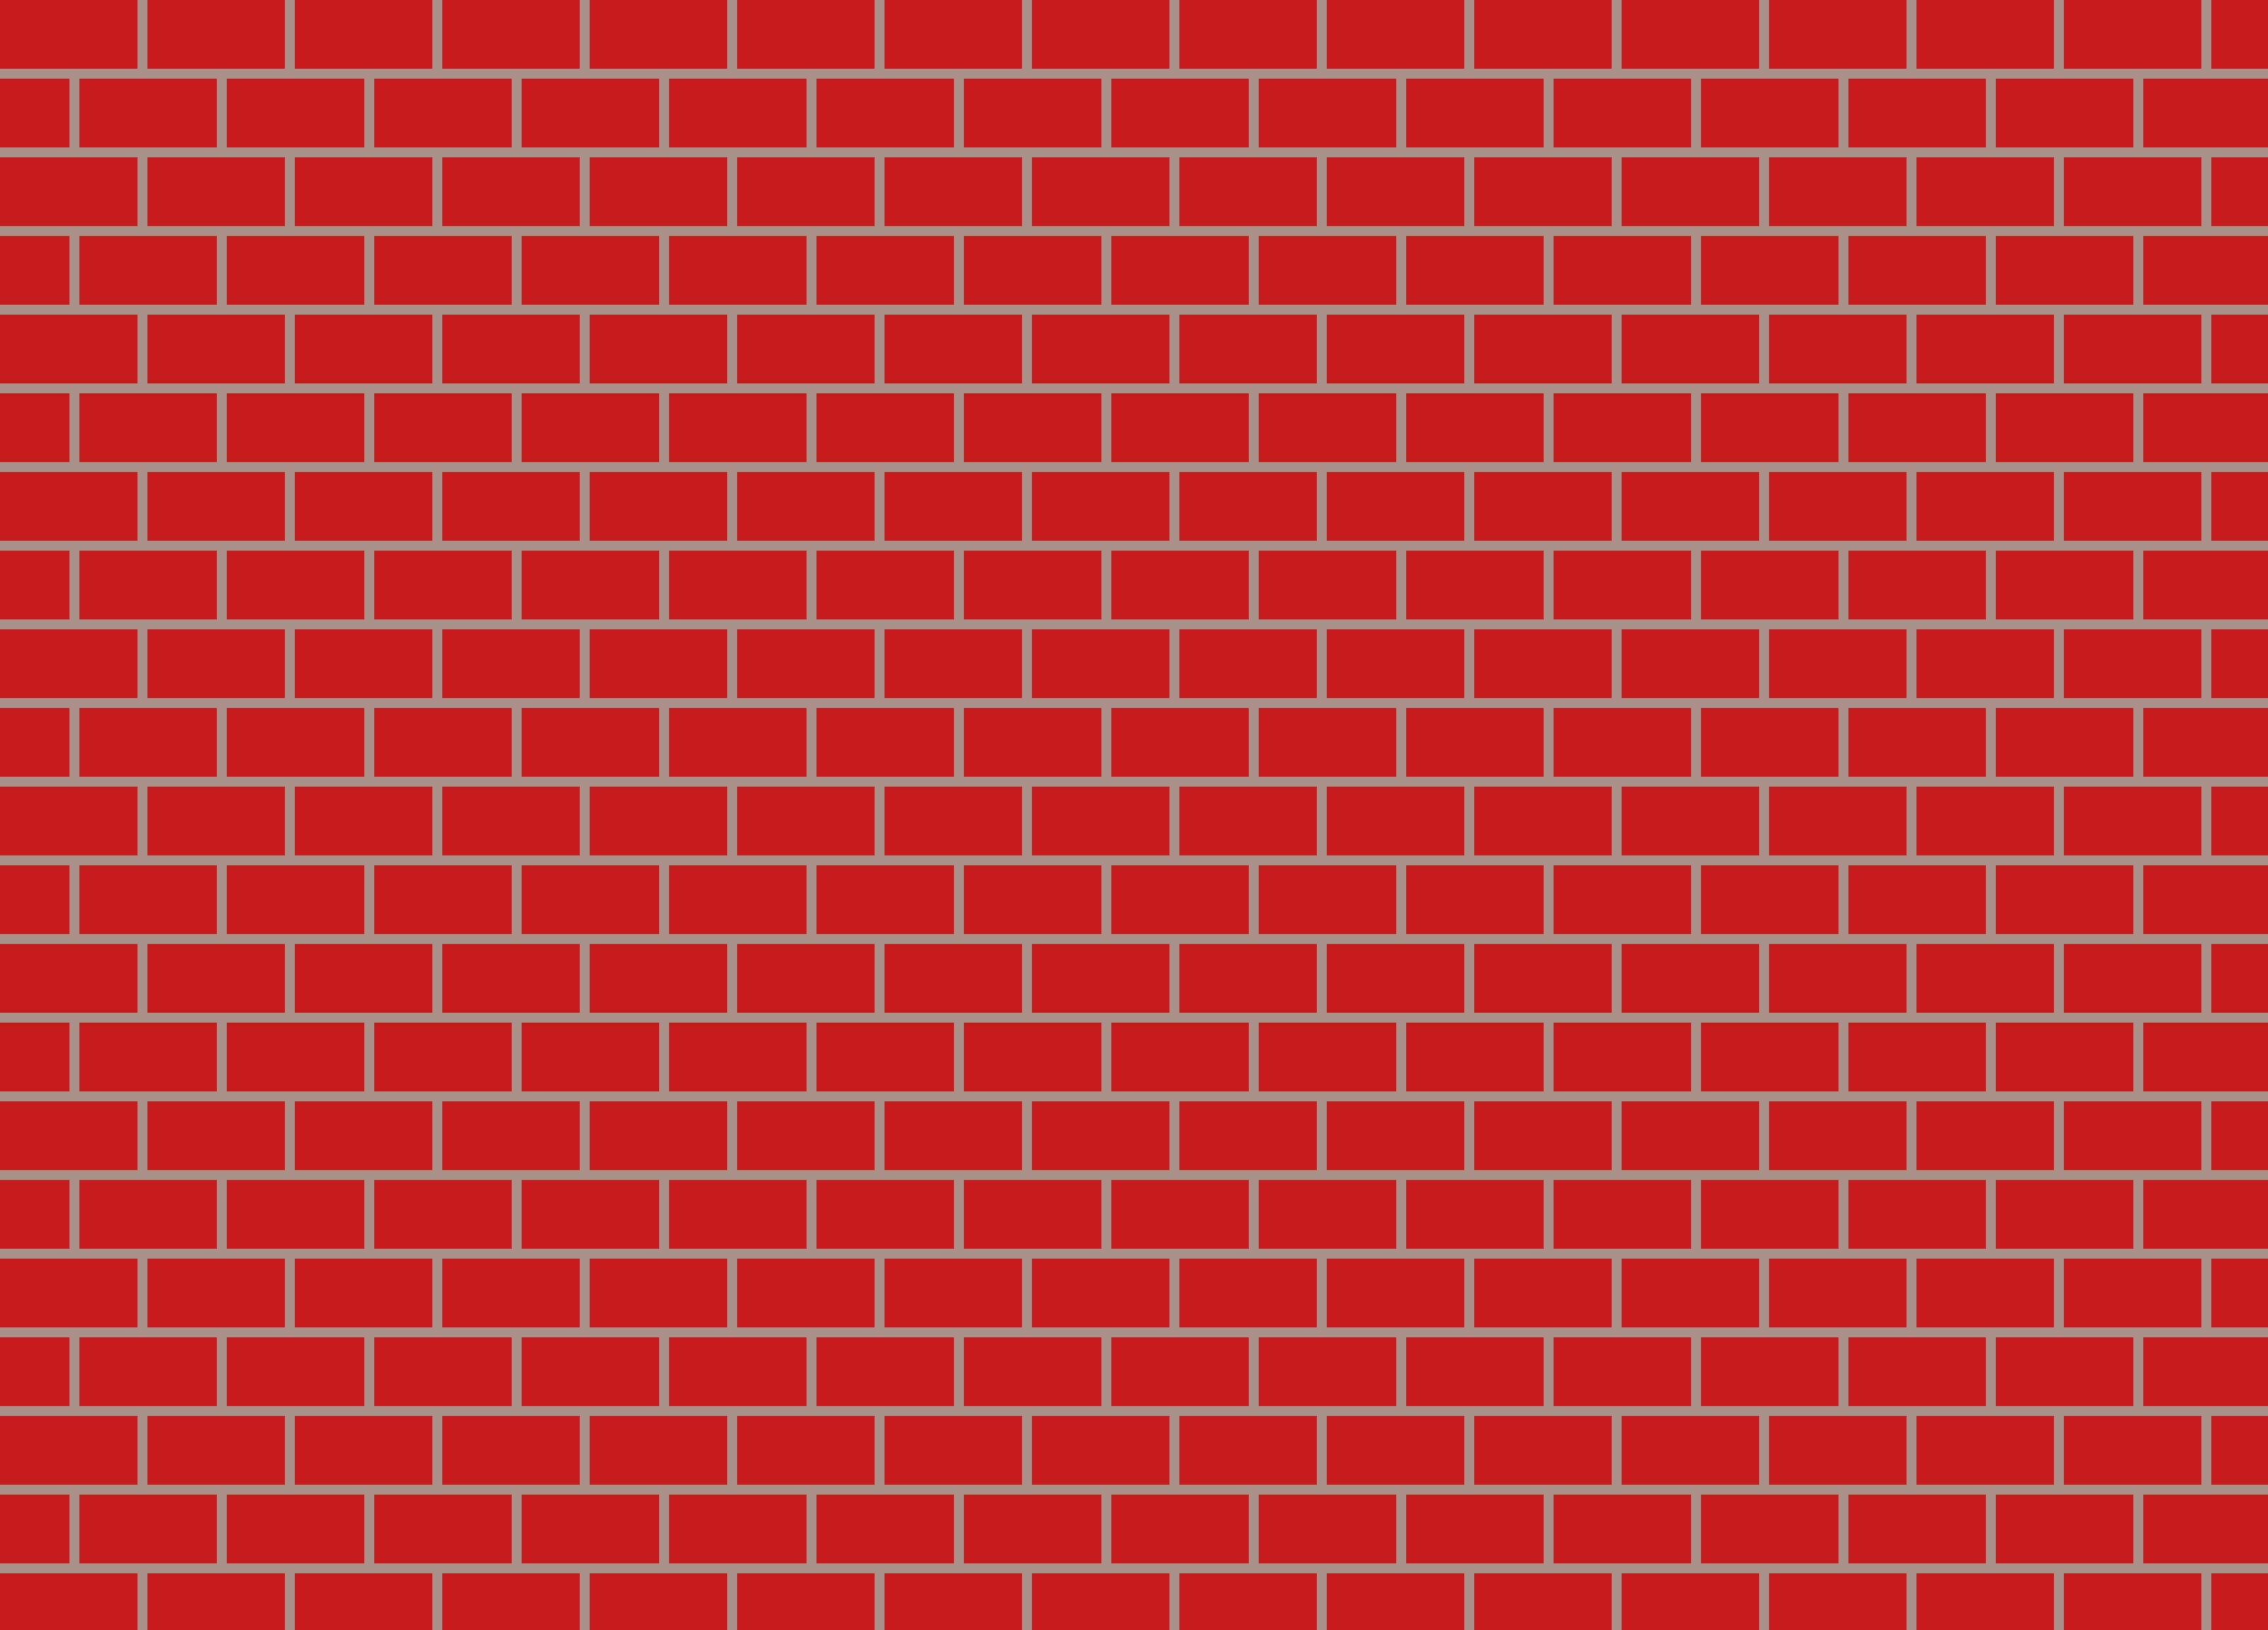 Brick Wall Free Images At Clker Com Vect-Brick Wall Free Images At Clker Com Vector Clip Art Online-6